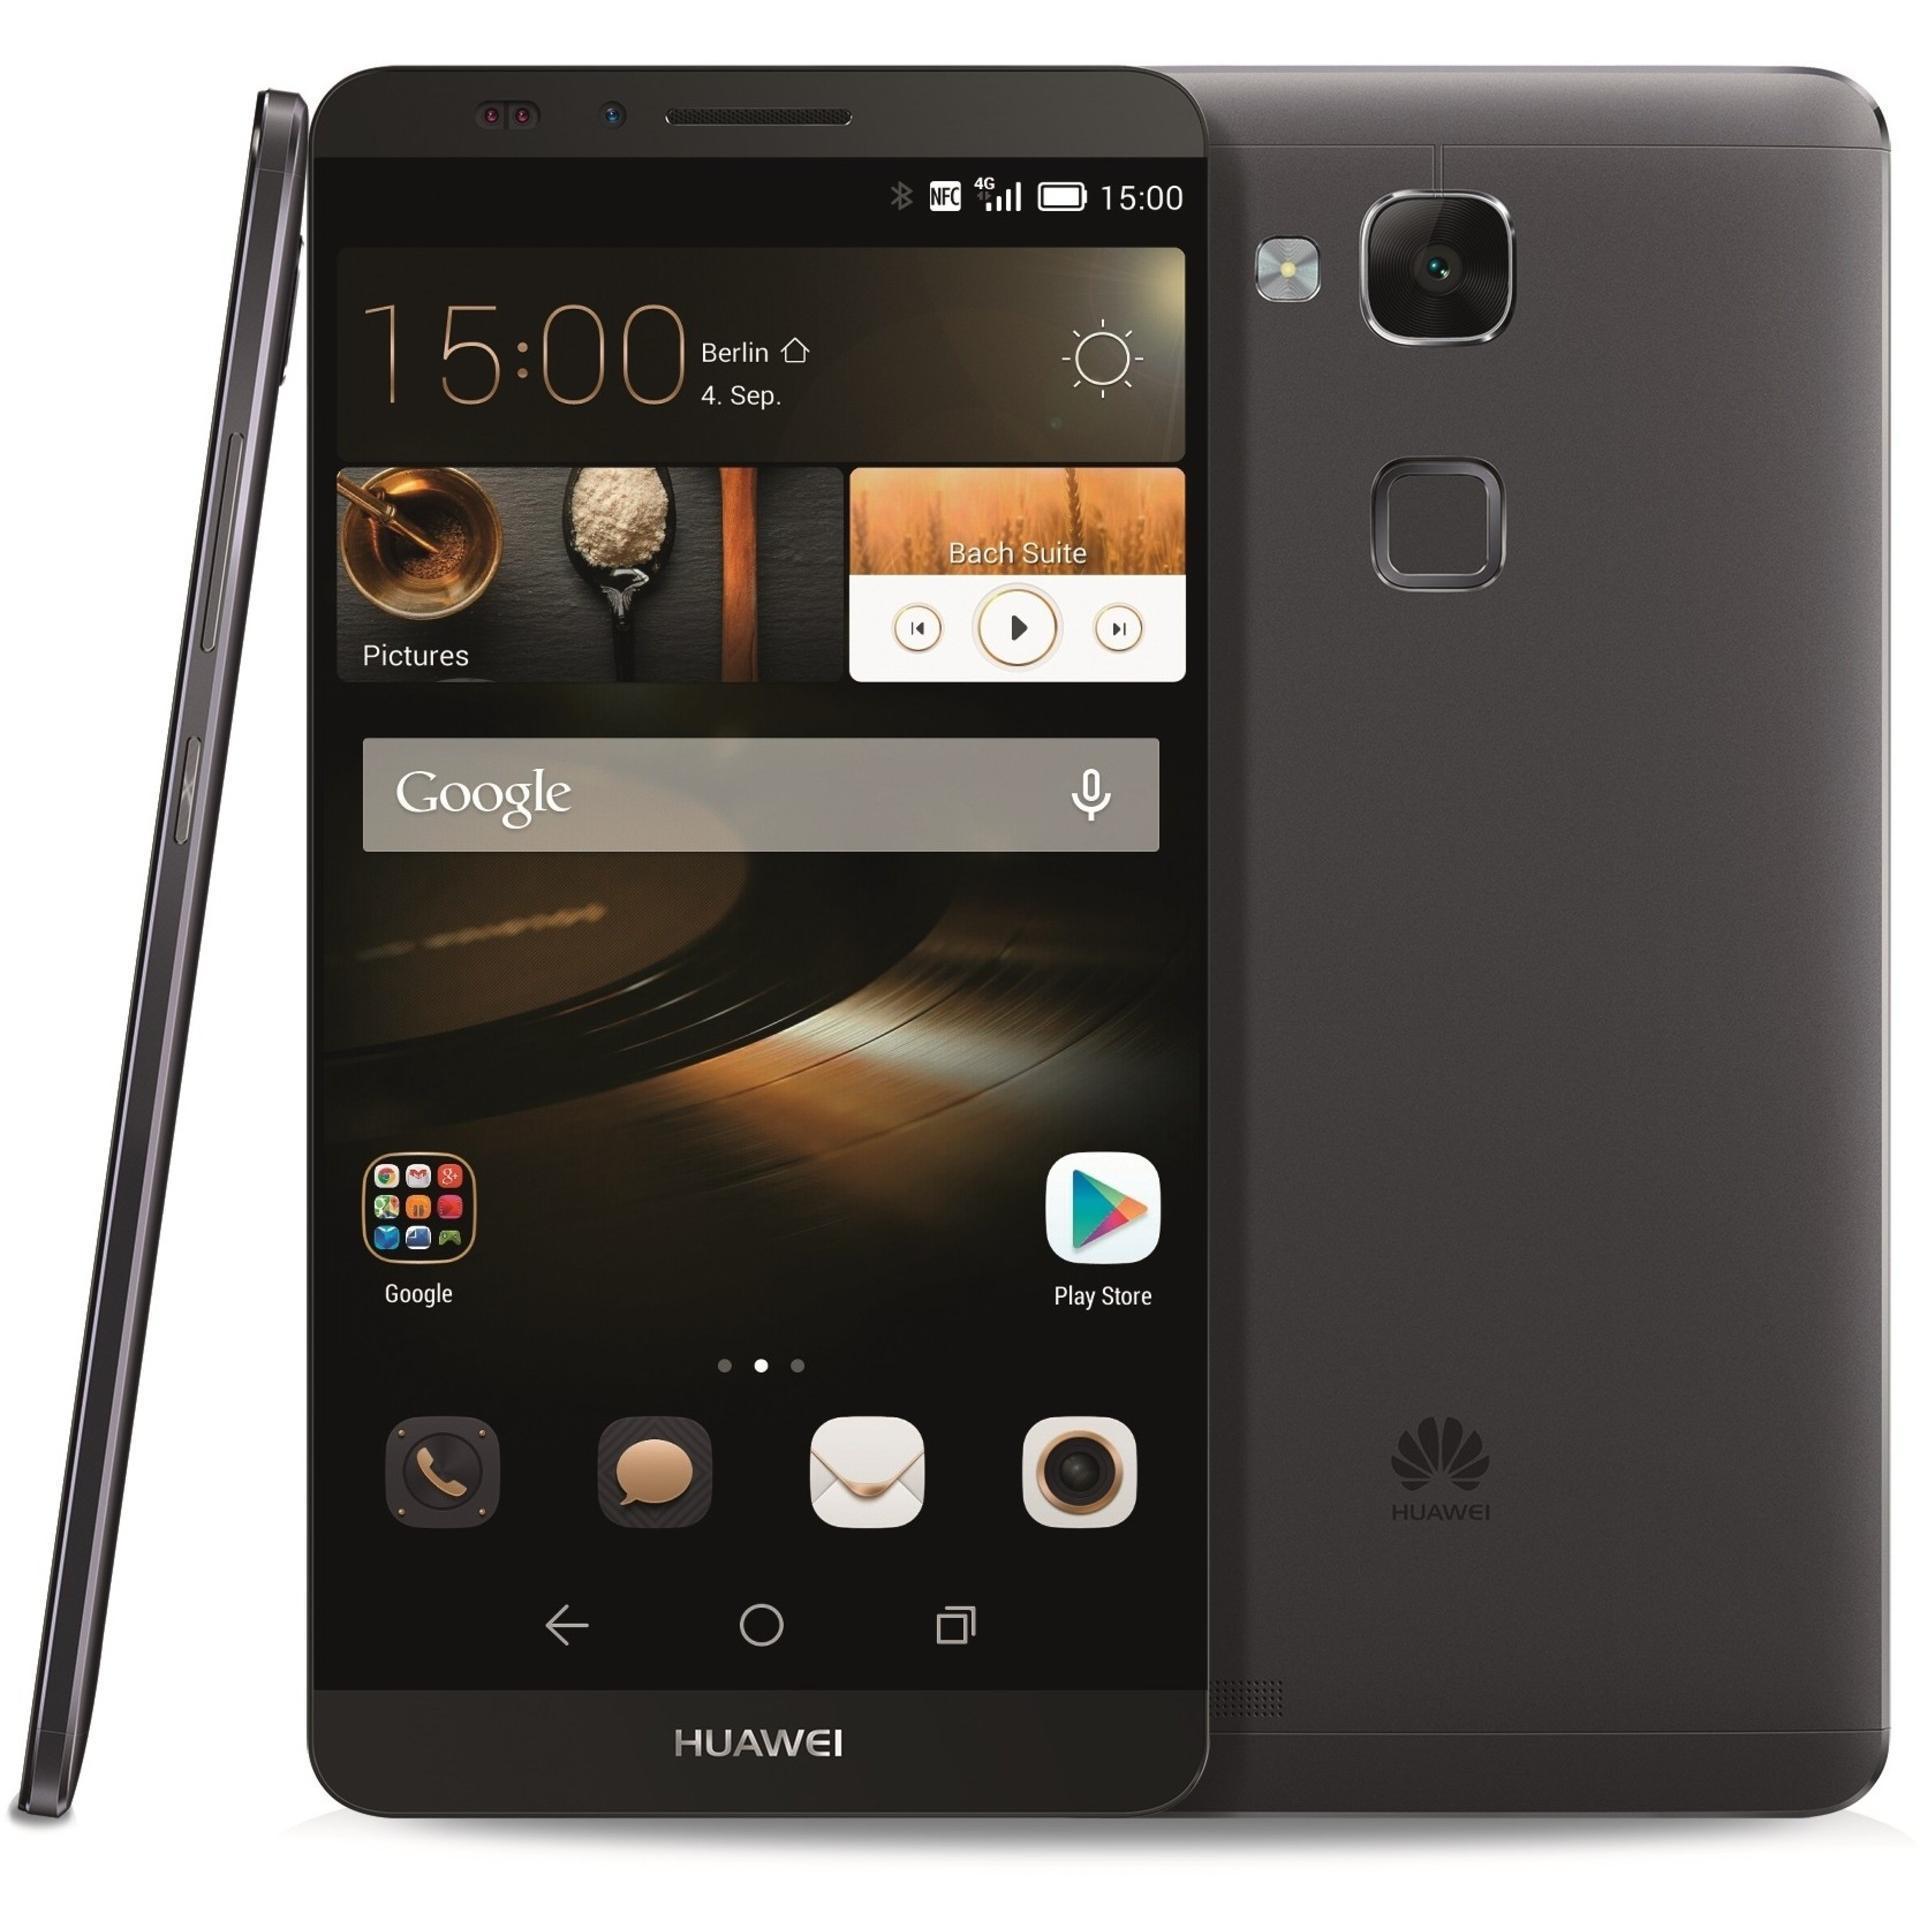 Huawei Ascend Mate 7 16 GB - Negro - Libre